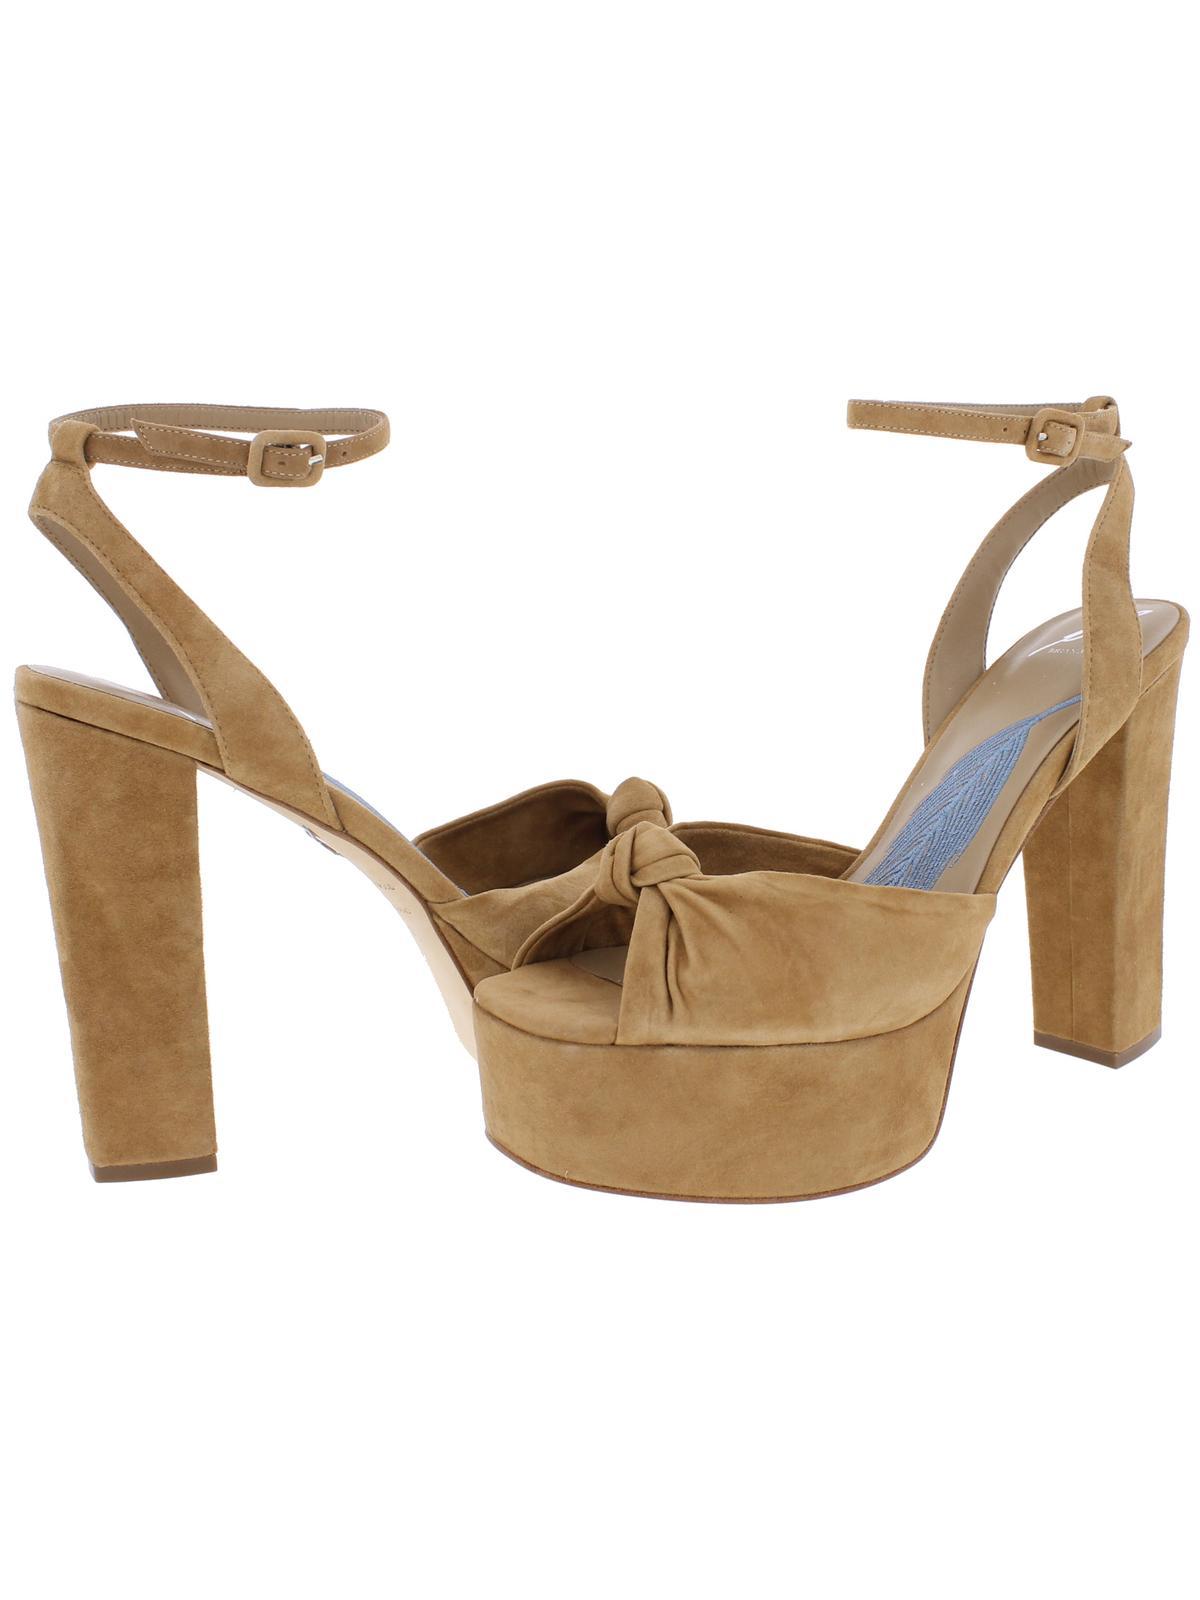 B Brian Atwood Womens Gabby Chunky Heel Square Toe Platform Sandals